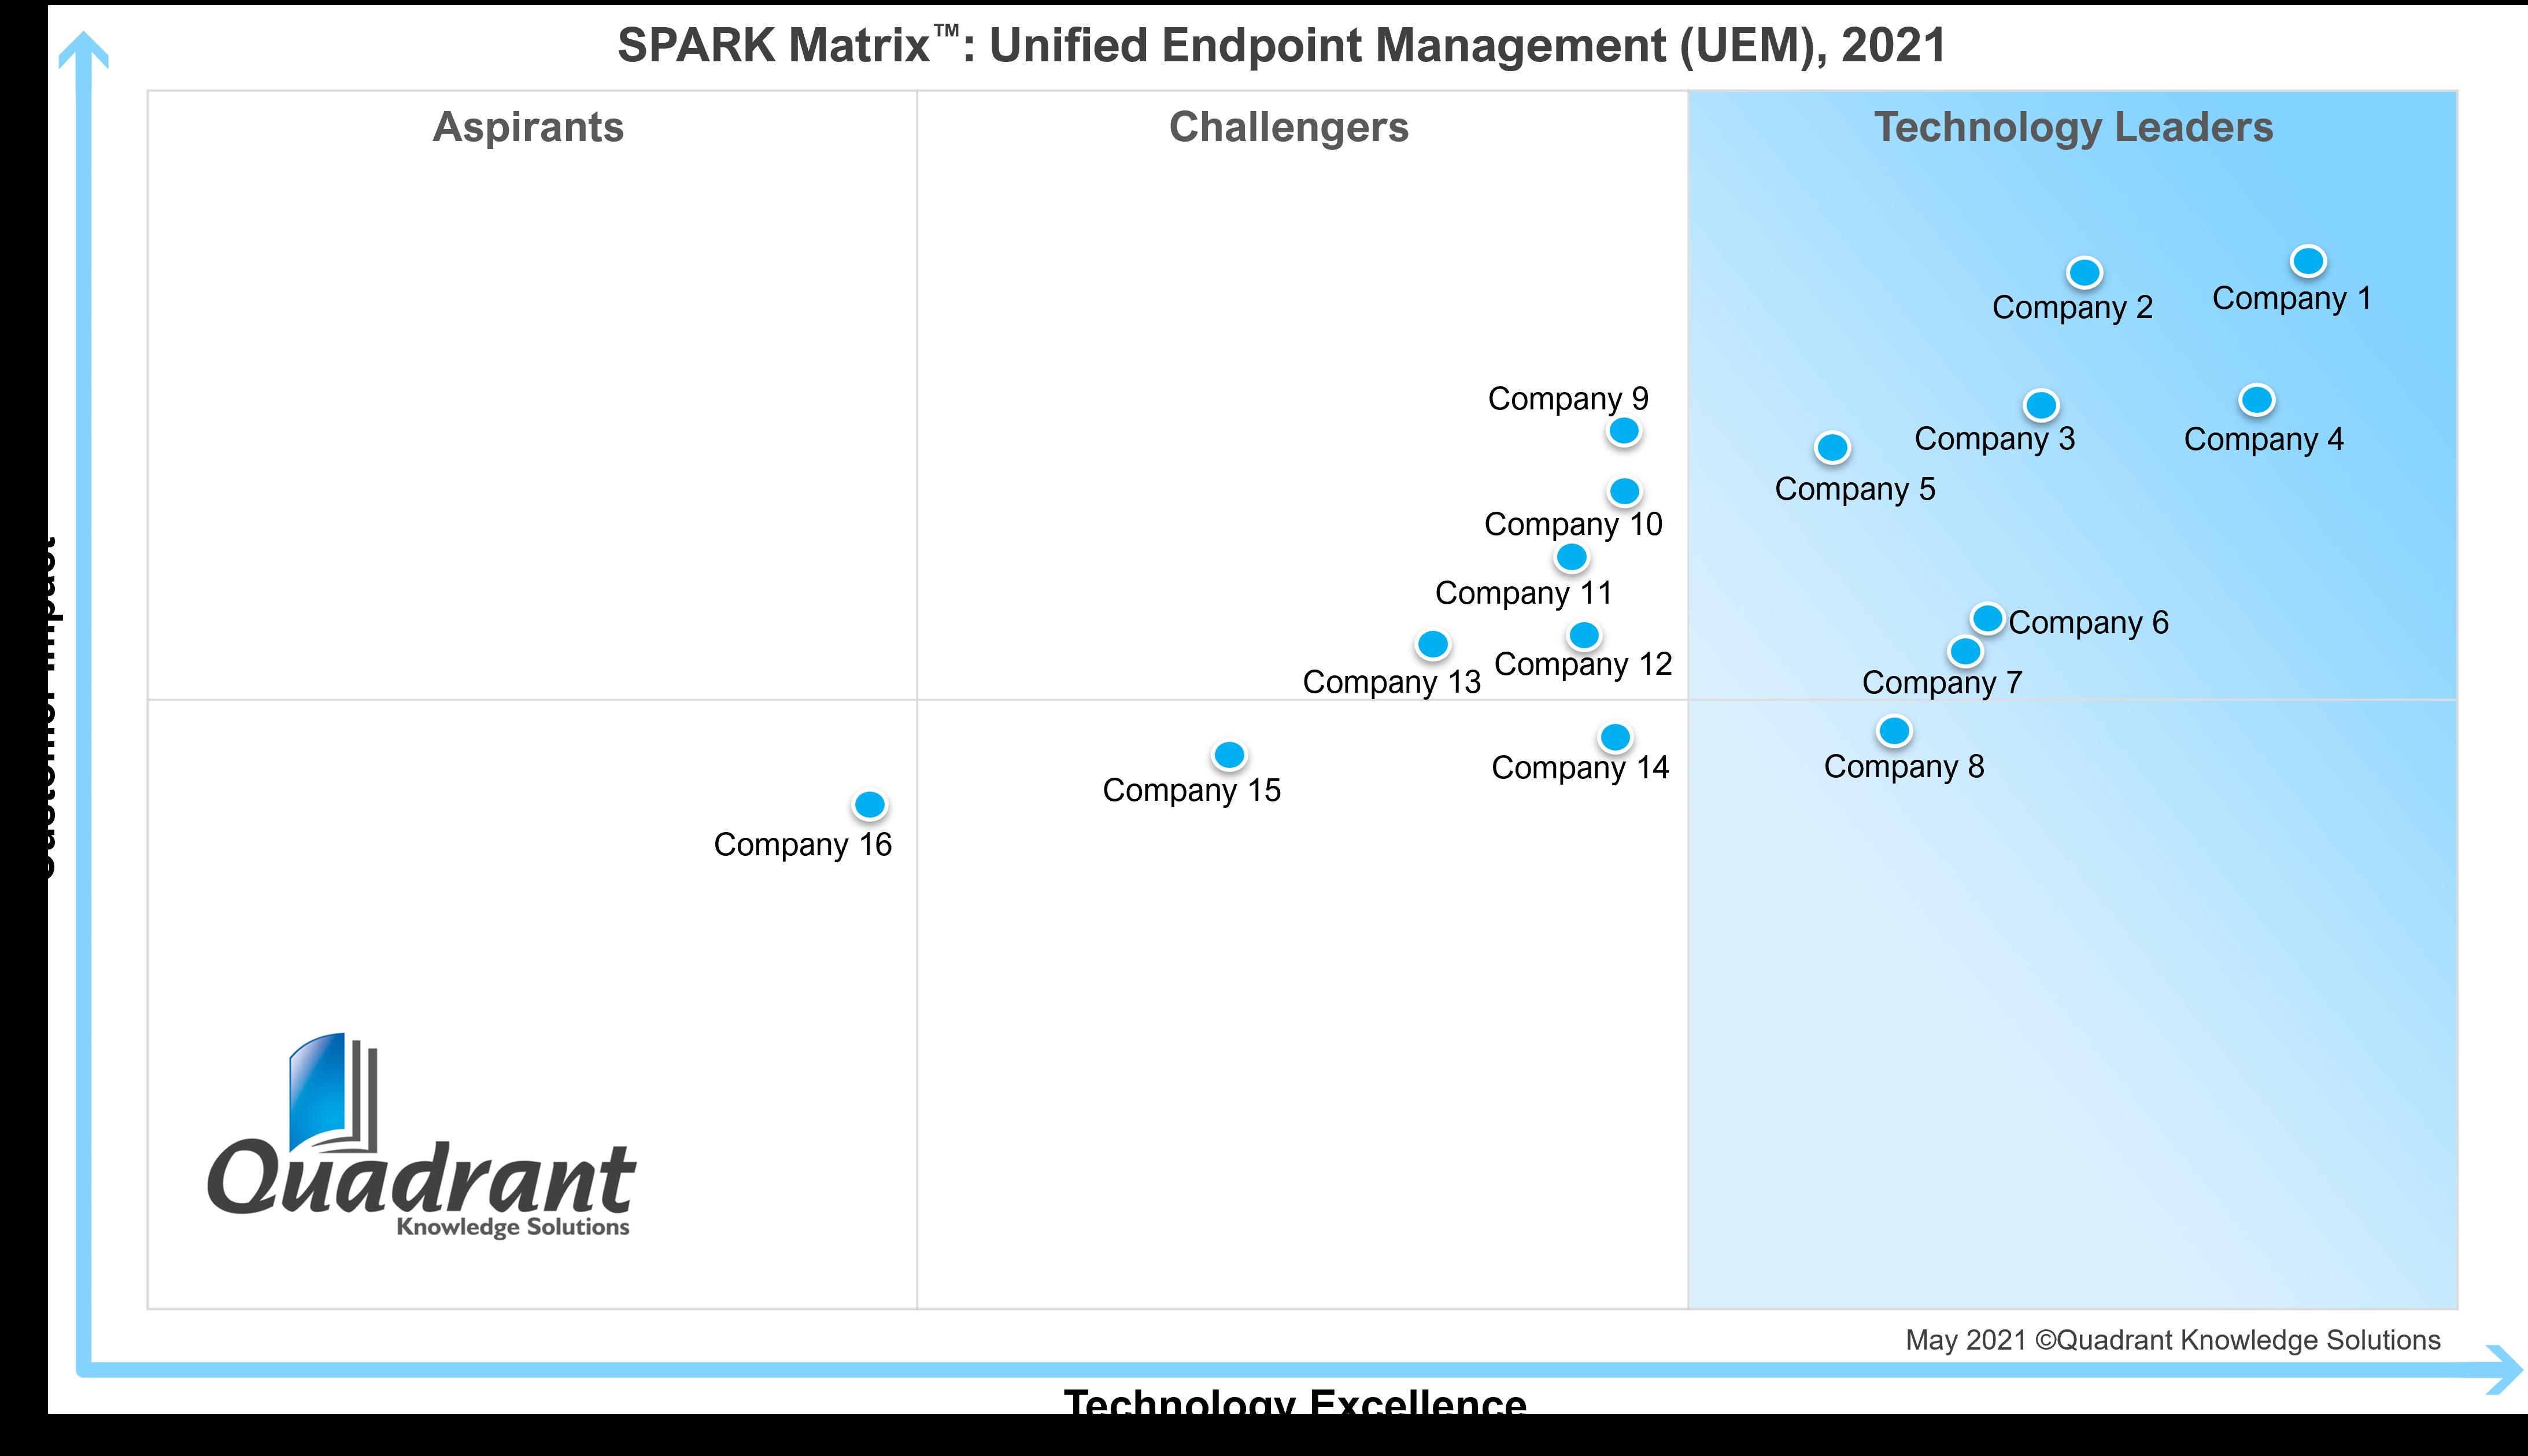 UEM SPARK Matrix